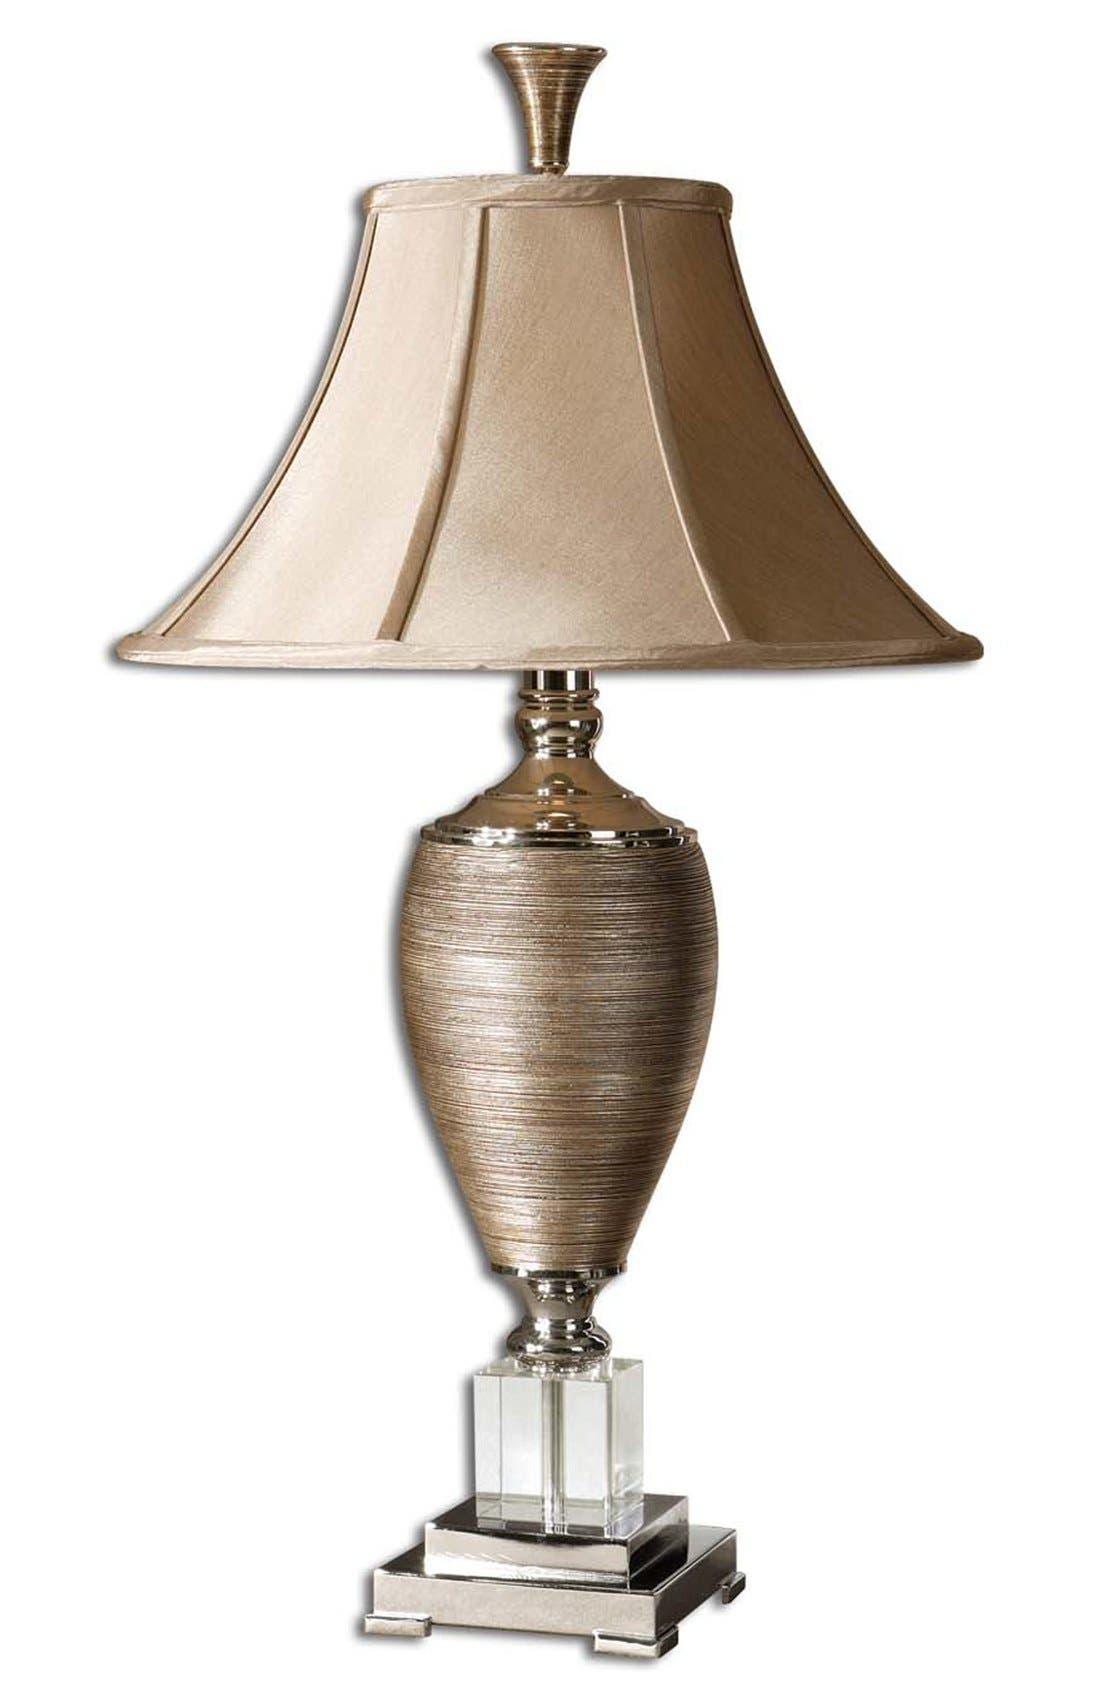 Main Image - Uttermost 'Abriella' Table Lamp